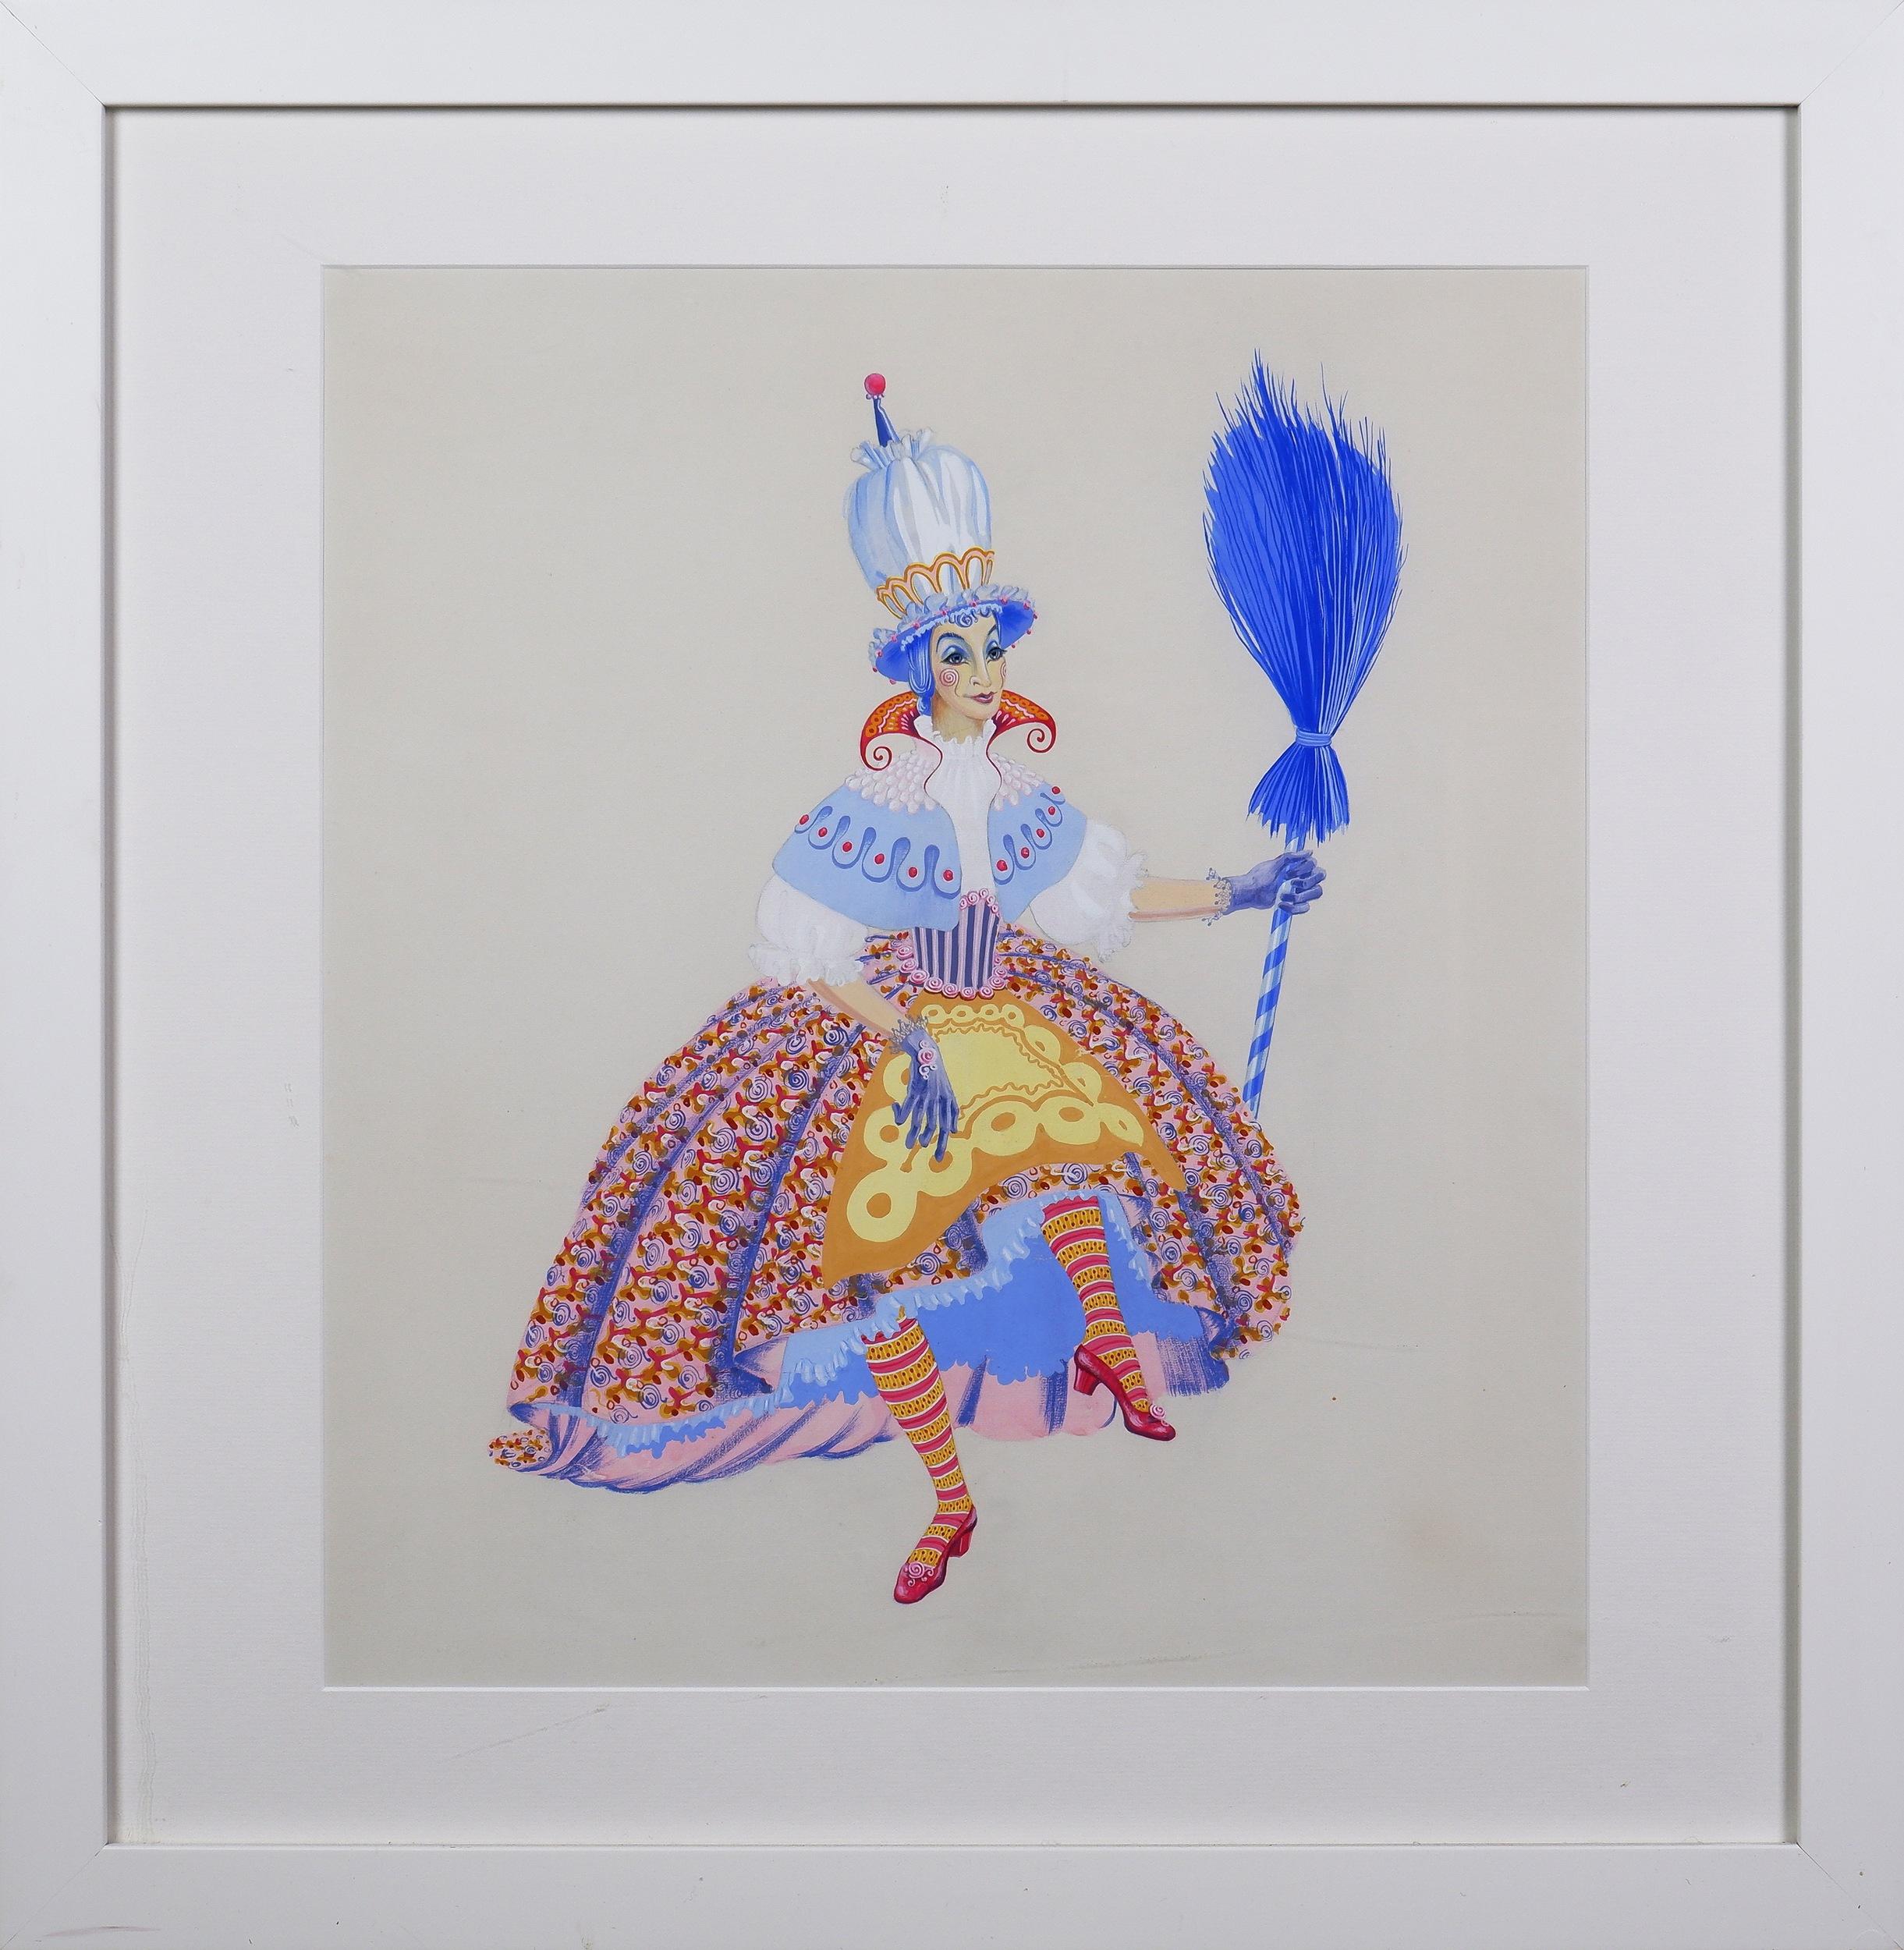 'Loudon Sainthill (1919-1969), Untitled (Cinderella Costume Design), Gouache, Pencil and Watercolour on Paper'